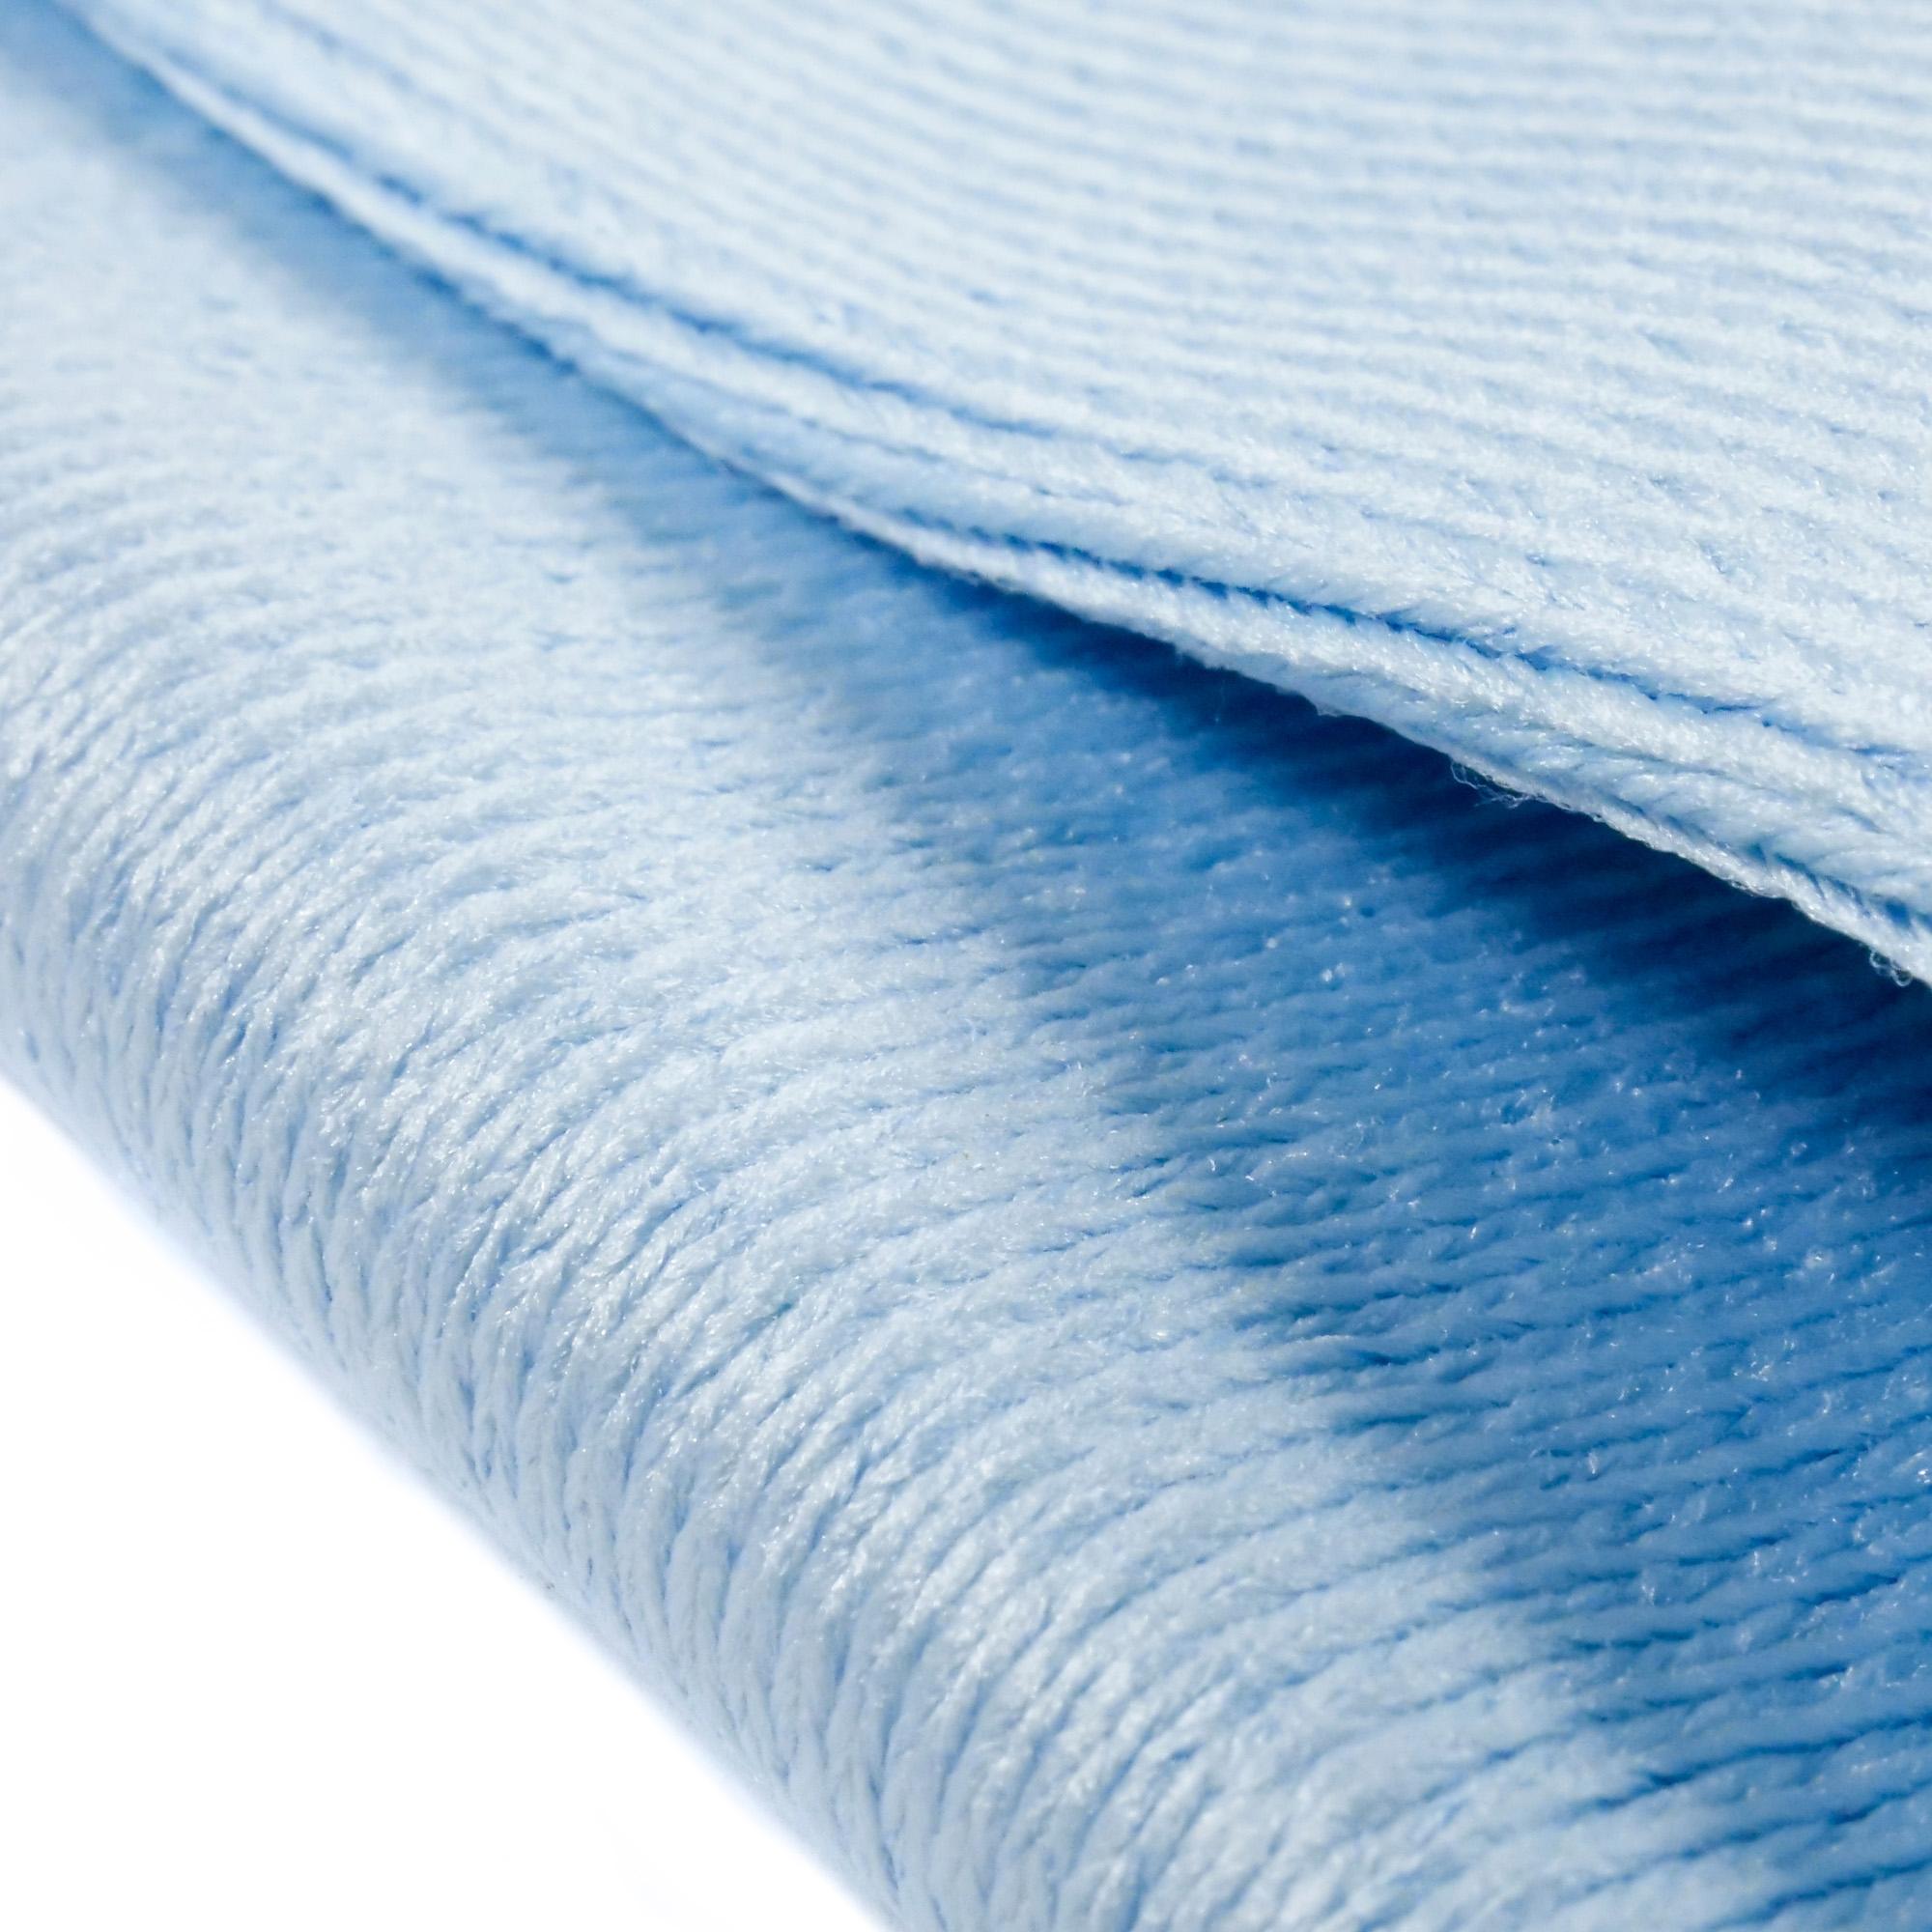 Glass Cleaning Towels (für nasse Anwendung) - 2er Pack